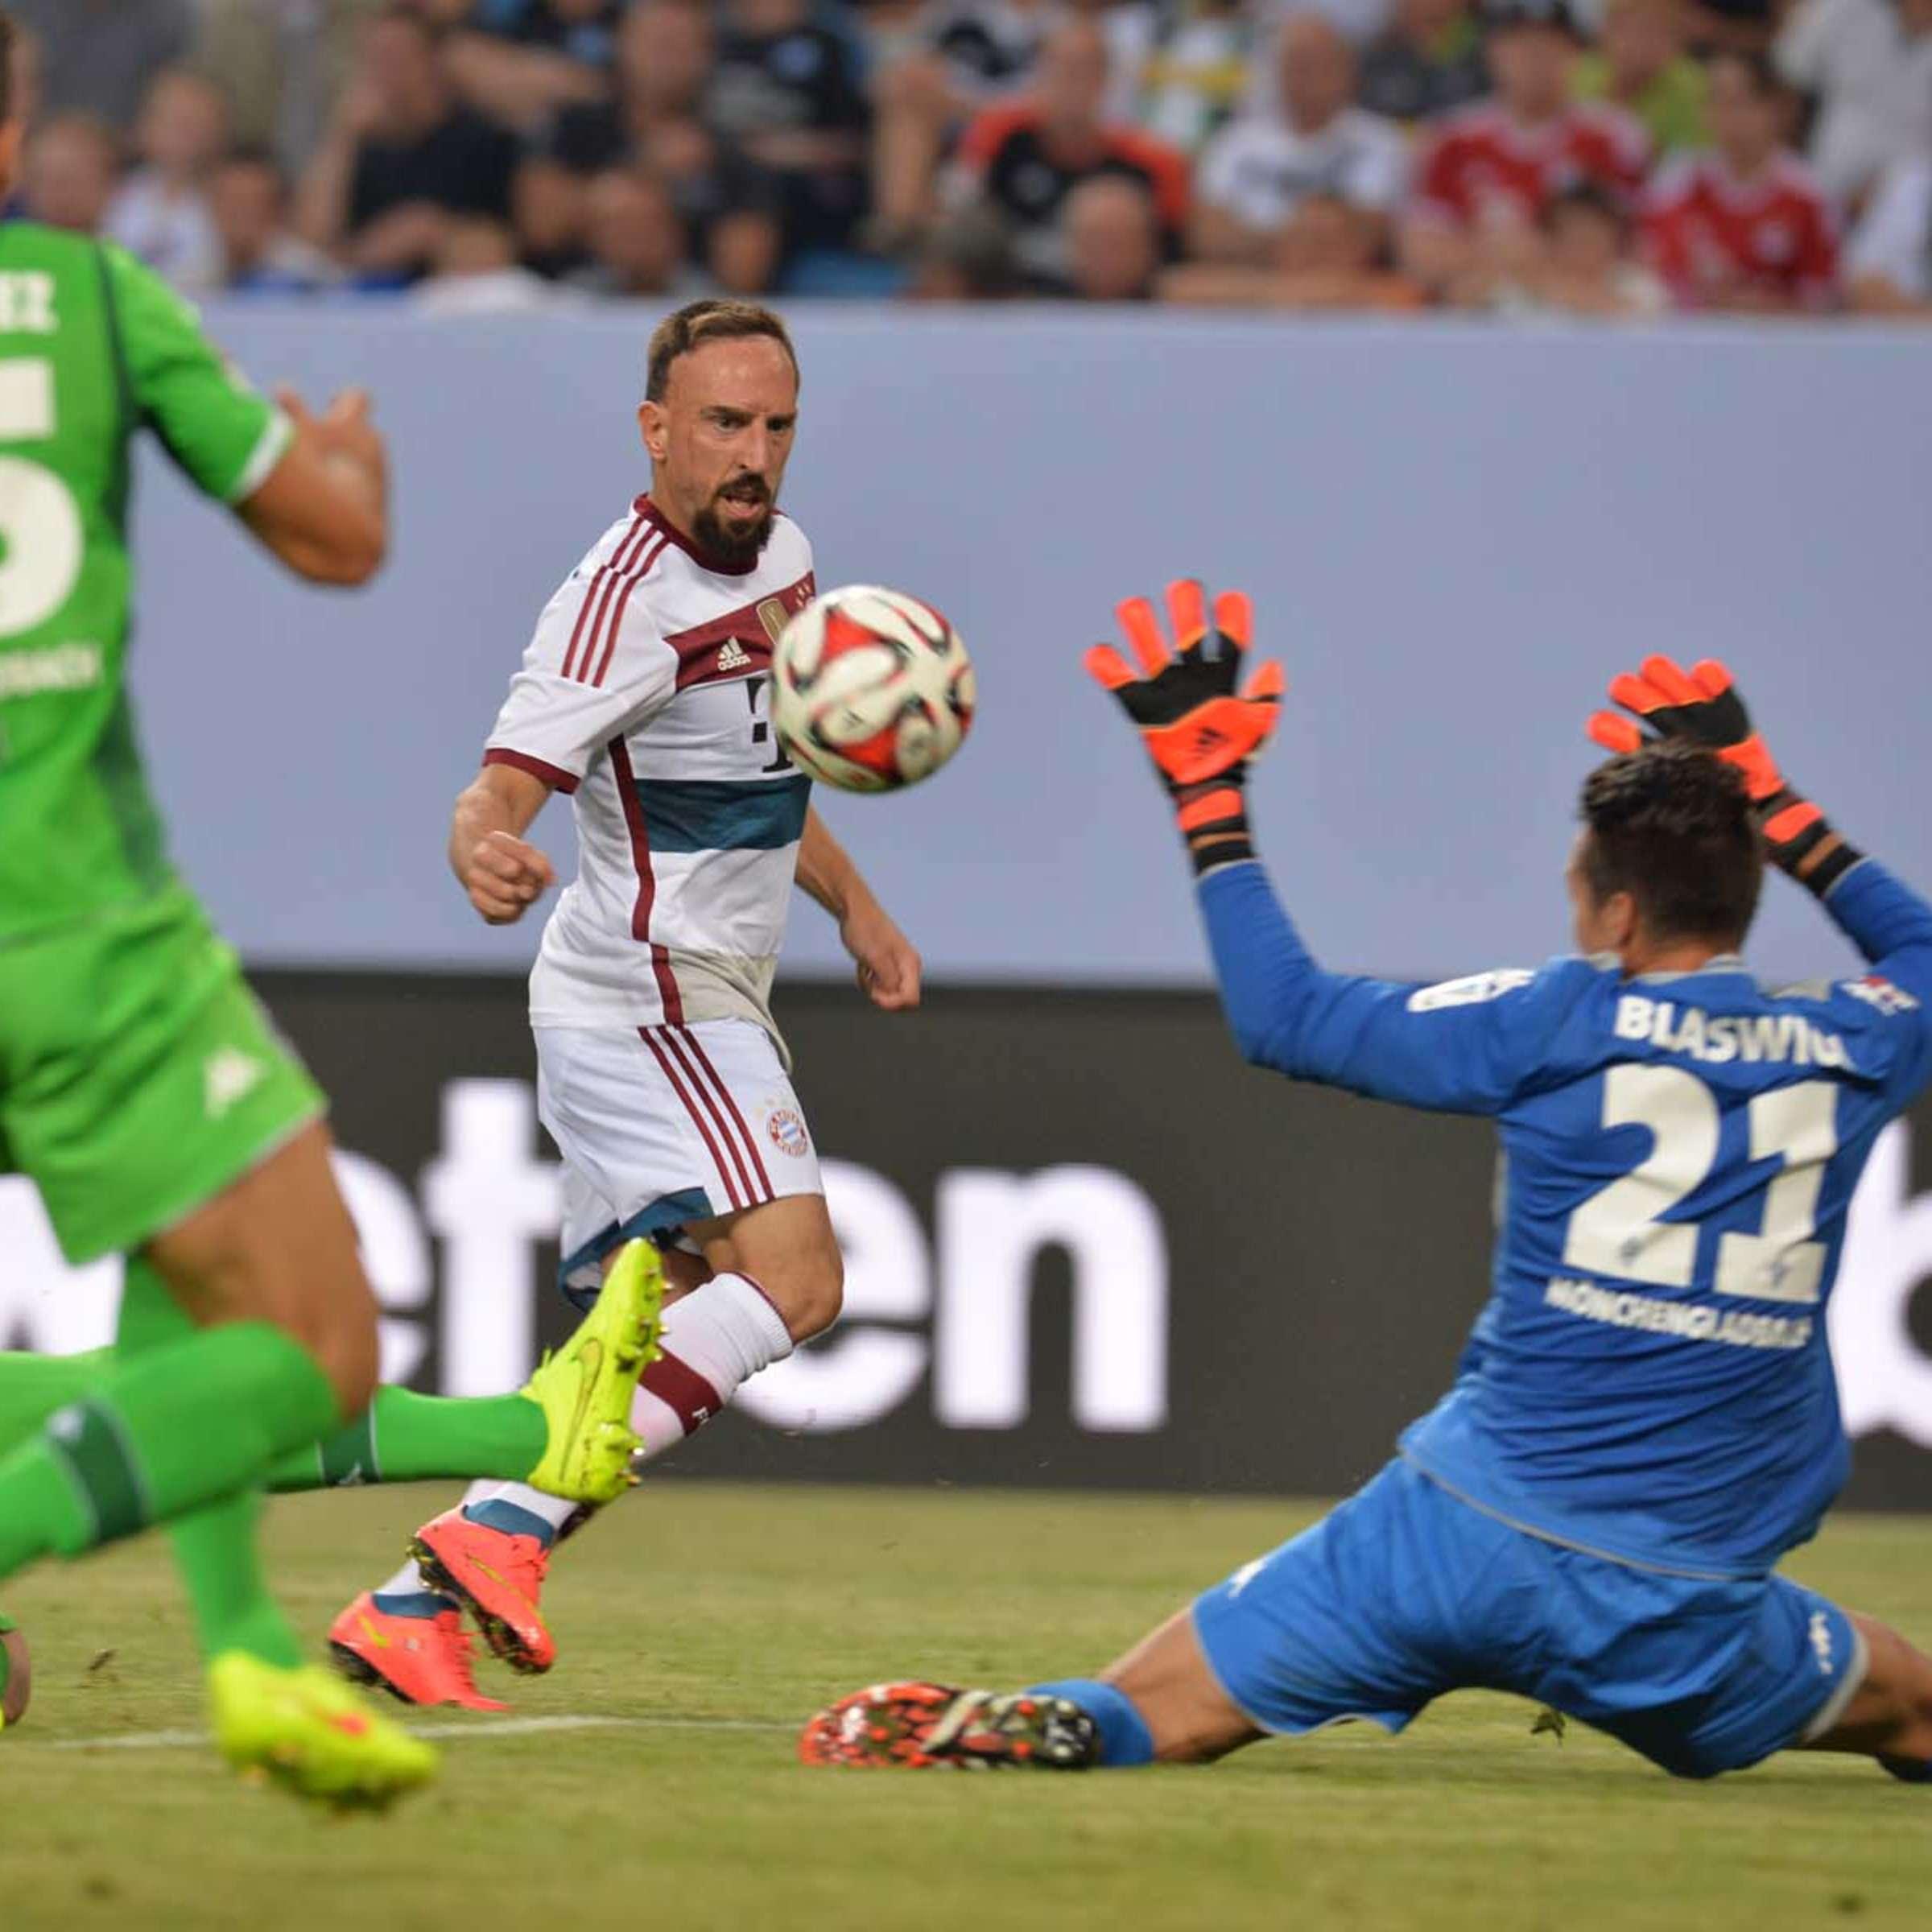 Borussia Mönchengladbach - FC Bayern: Bundesliga-Spiel heute im Live-Stream  und TV auf Sky | FC Bayern